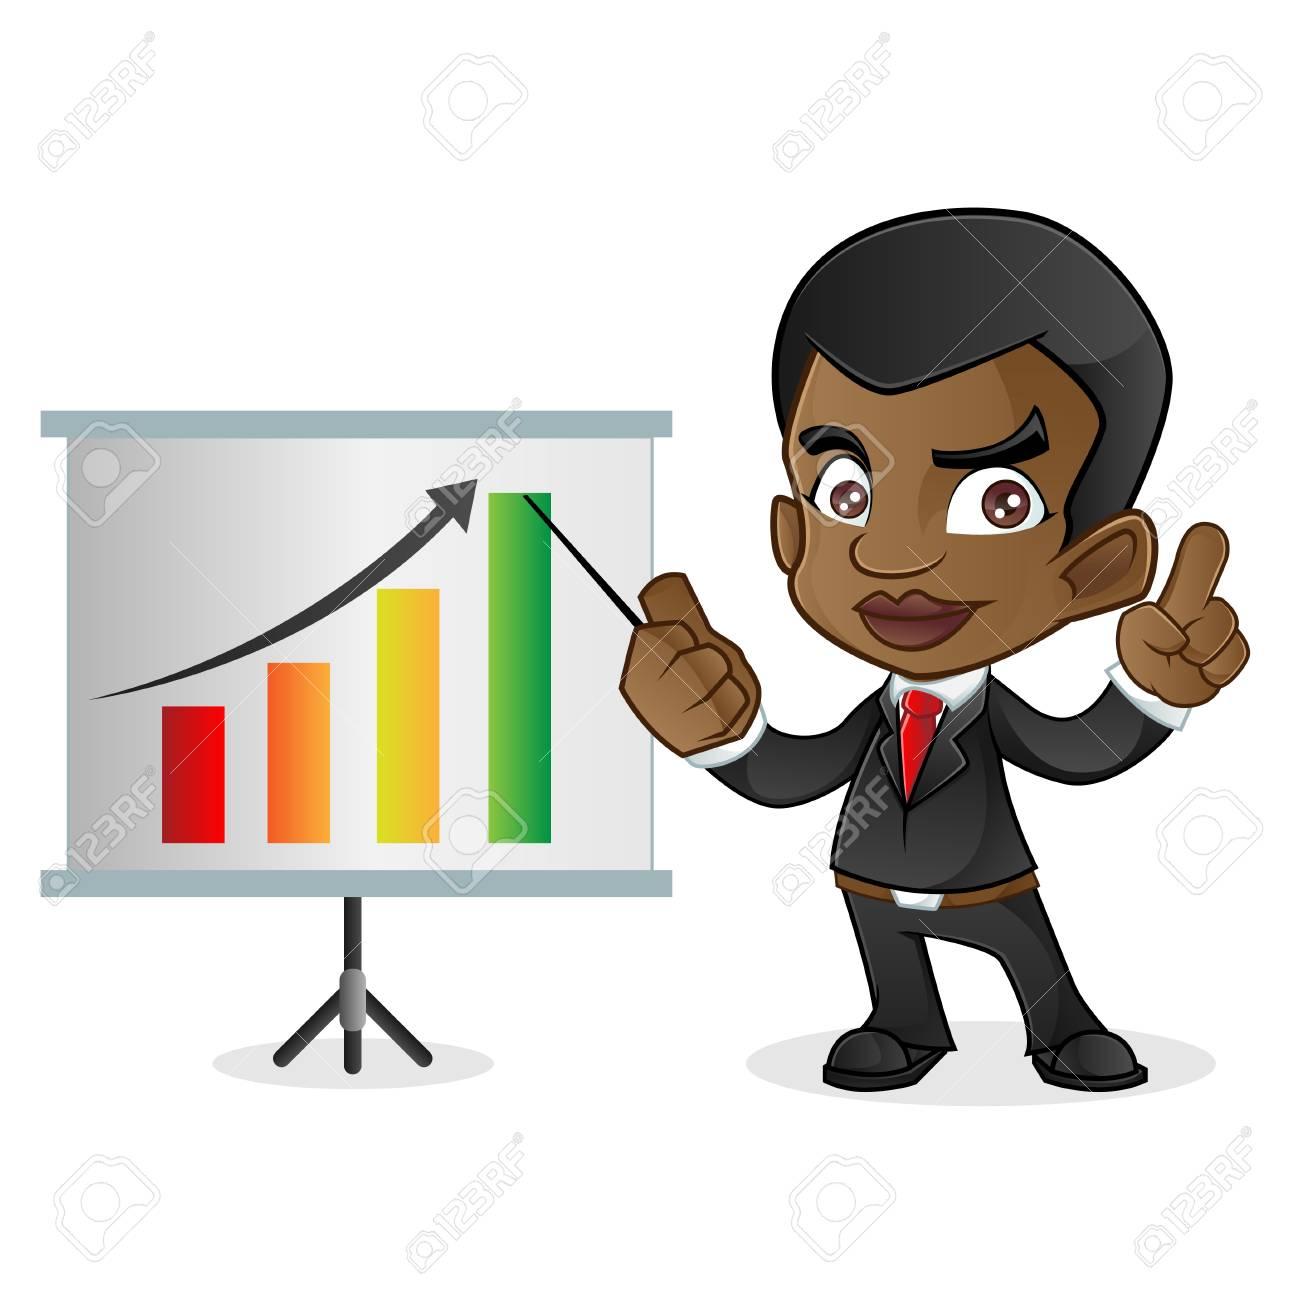 Black Business Man Talking Vector Cartoon Clipart - FriendlyStock